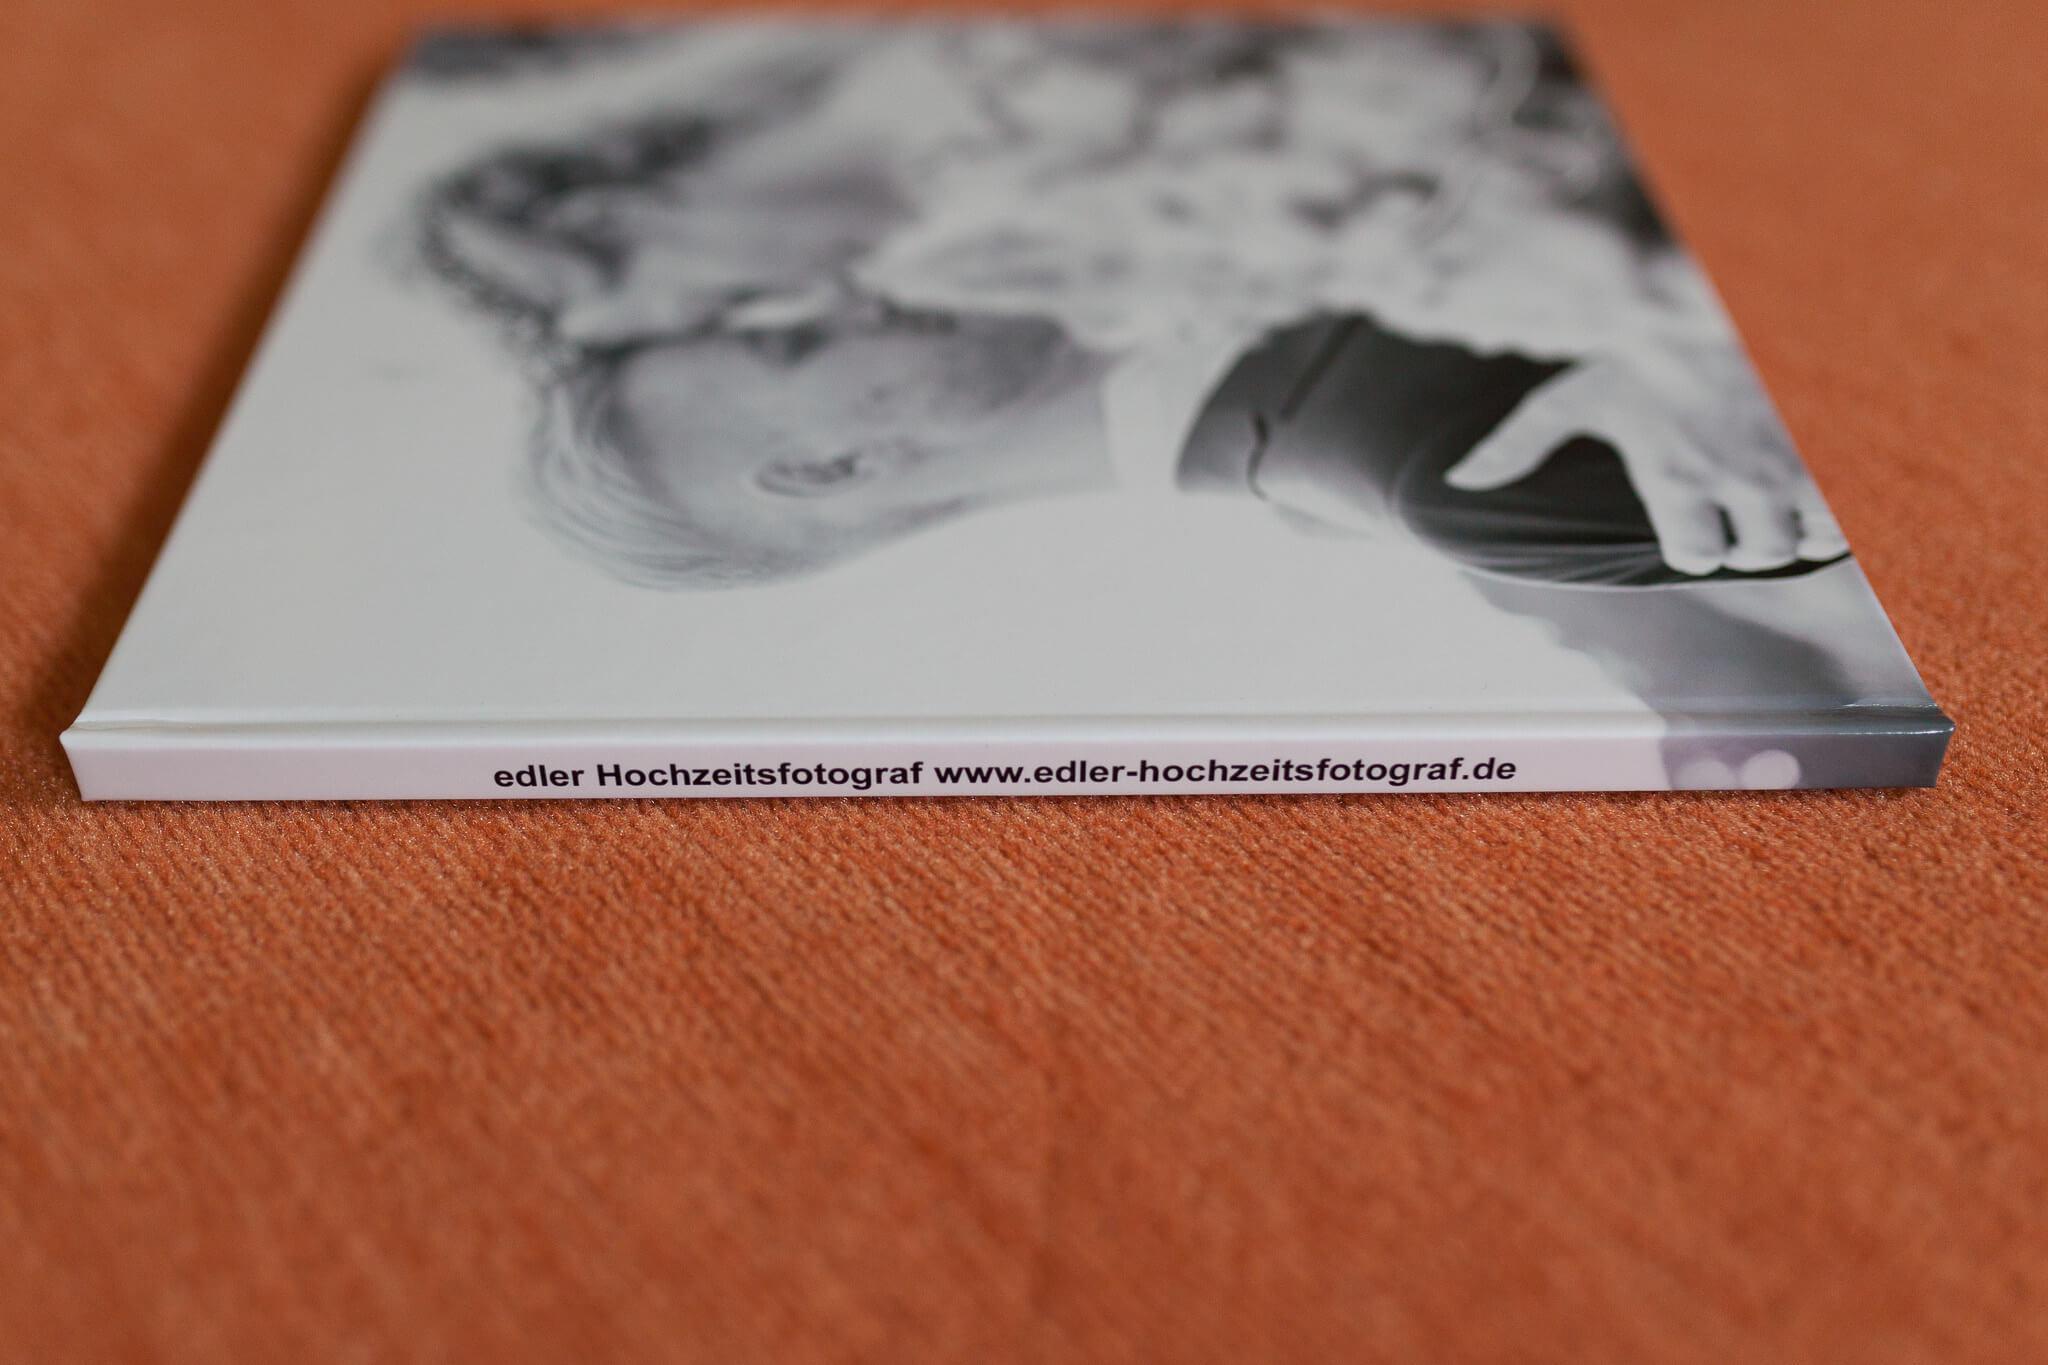 test-fotobuch-saal-digital-edler-hochzeitsfotograf.de